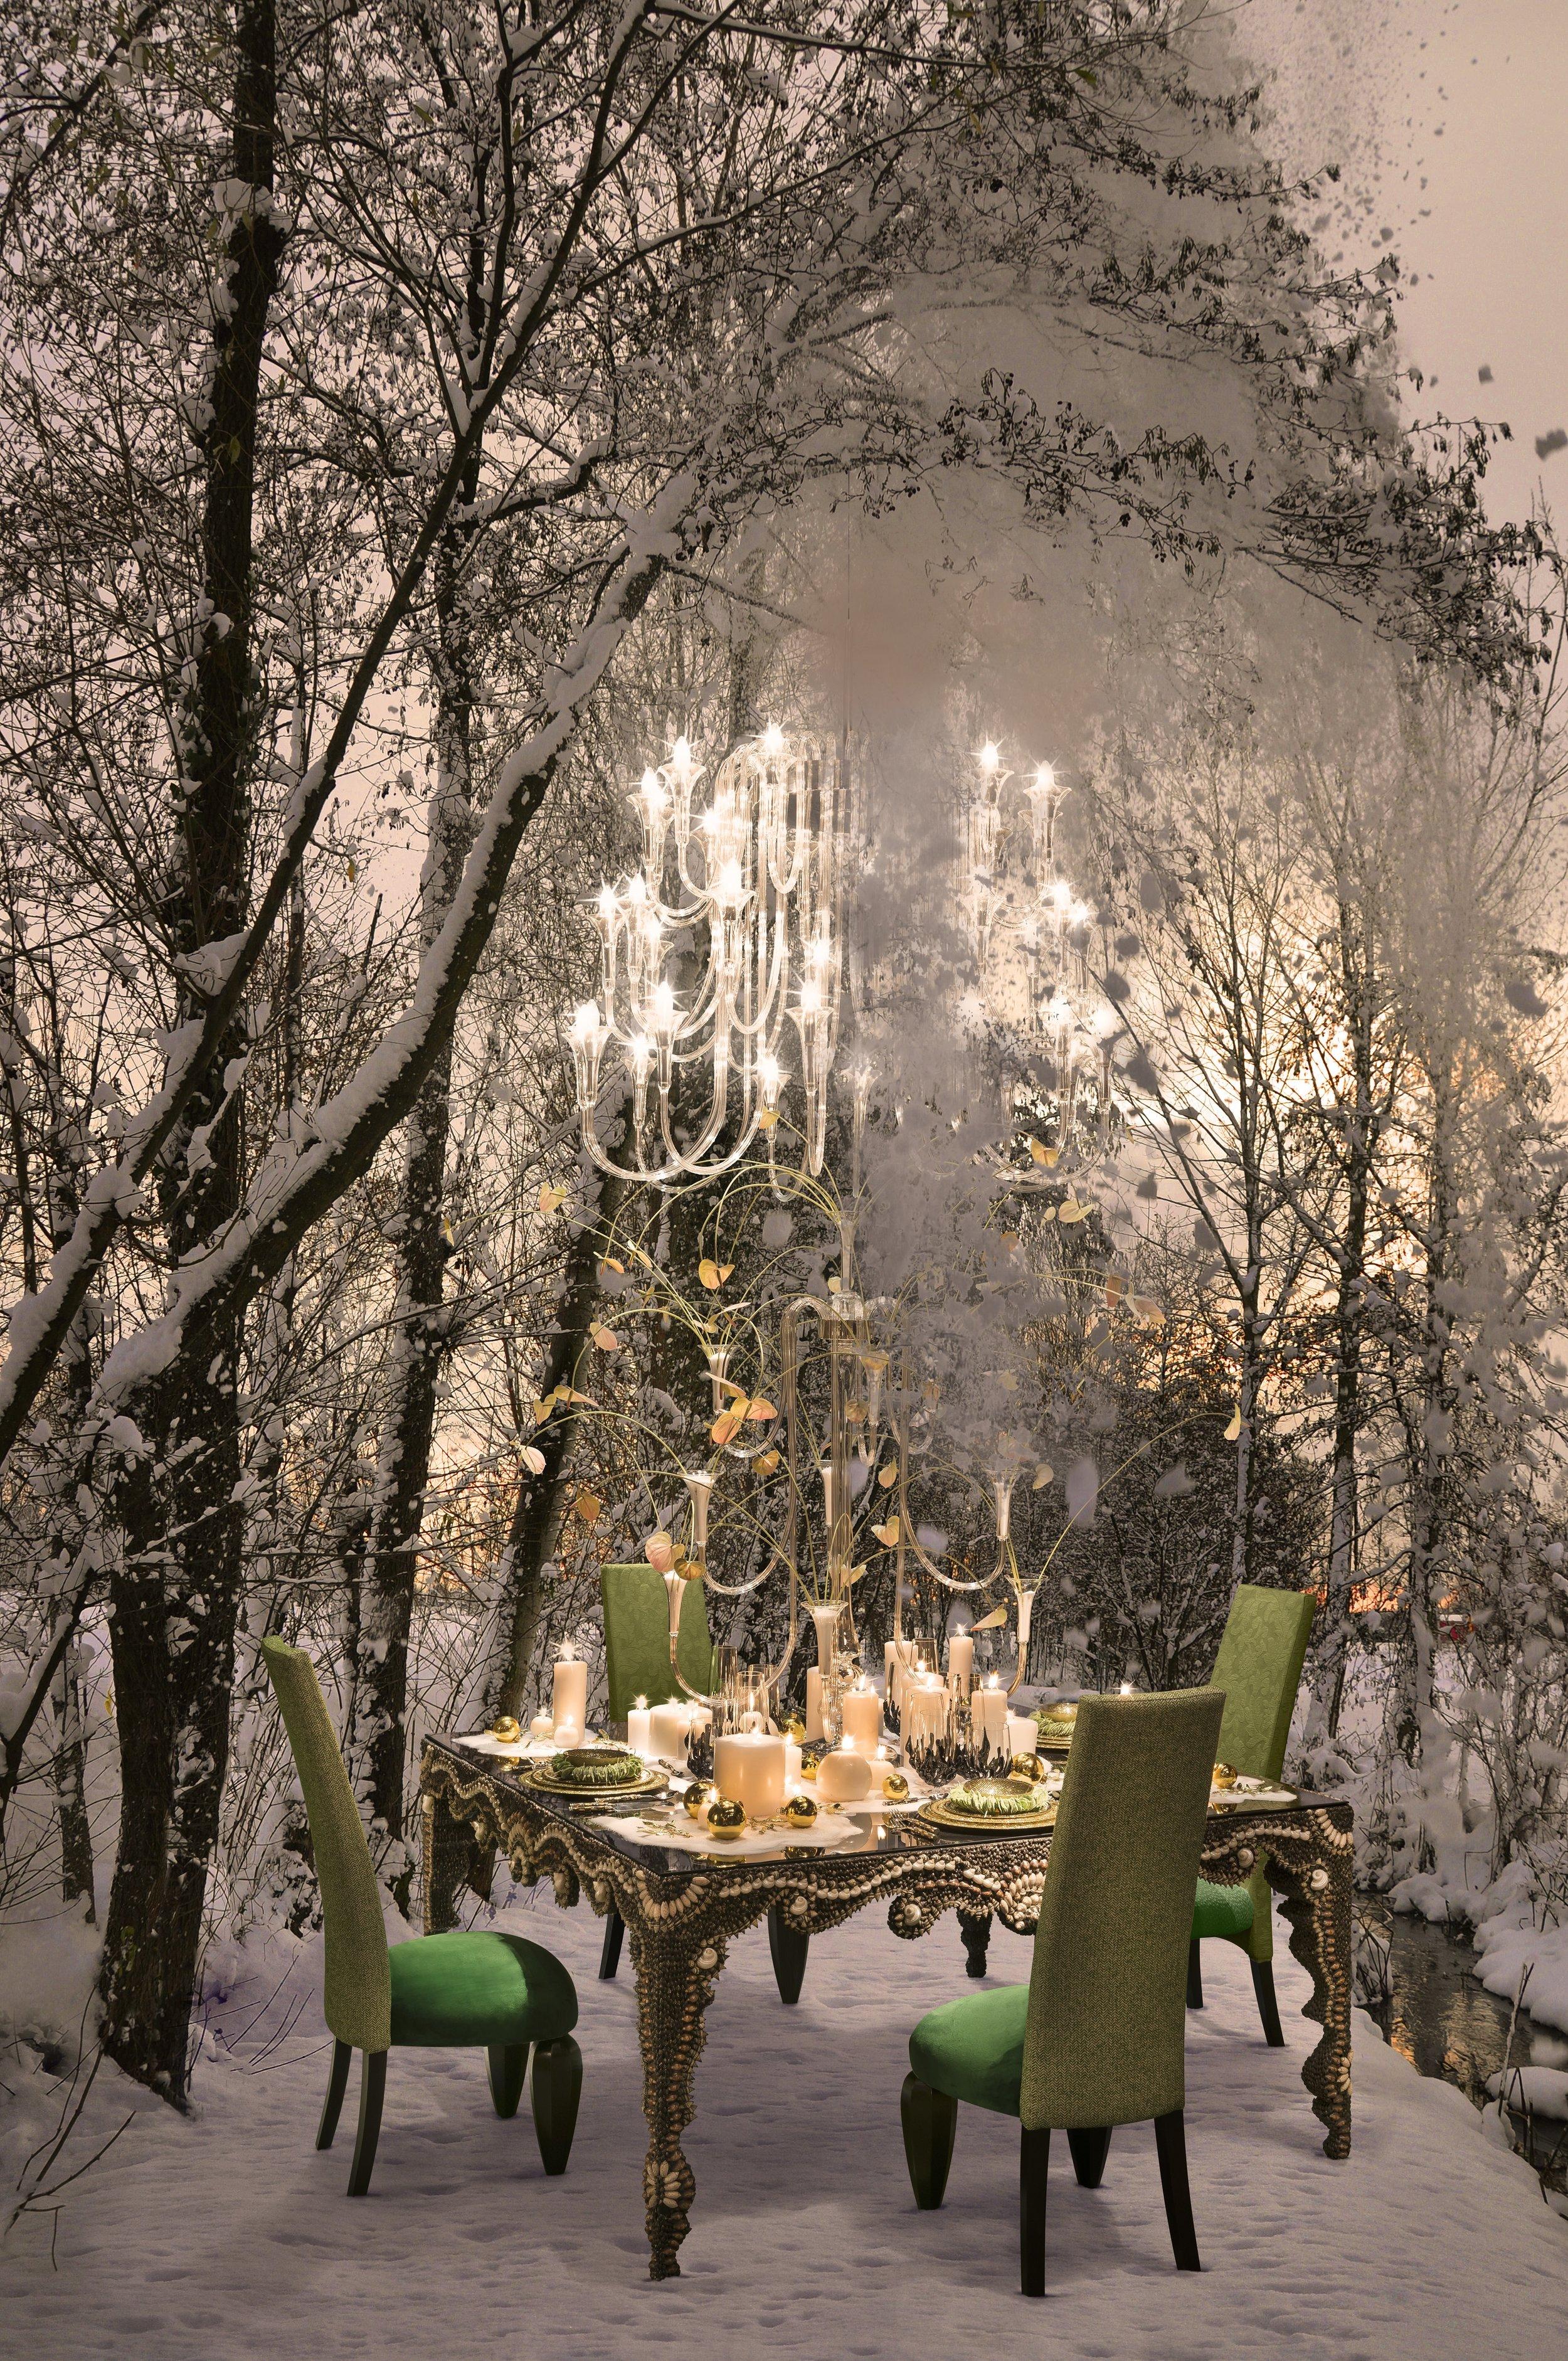 Interiors Advent Calendar - Christmas dining by VG New Trend @ Masha Shapiro Agency.jpg